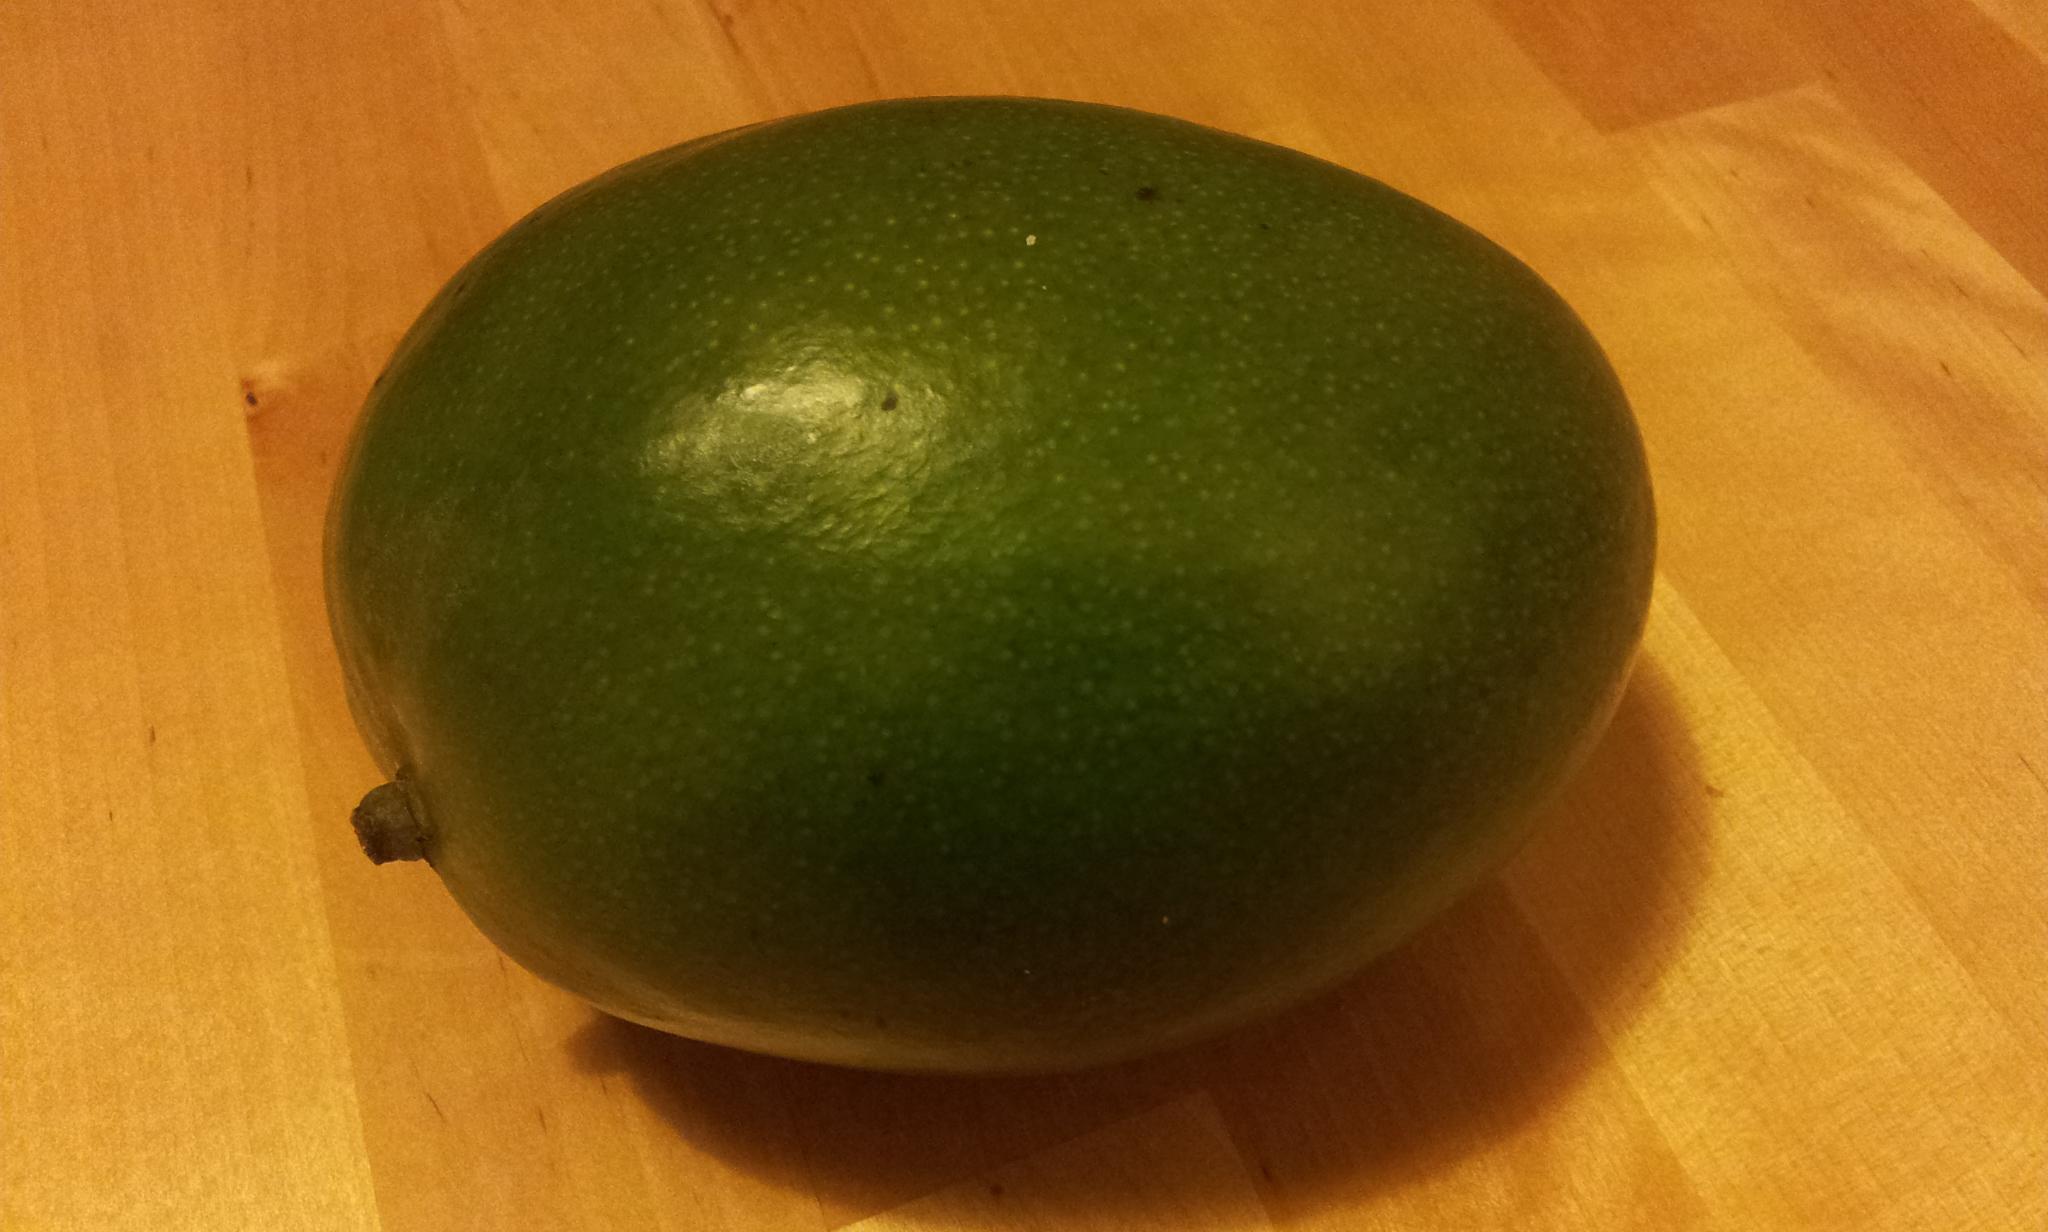 One ripe mango